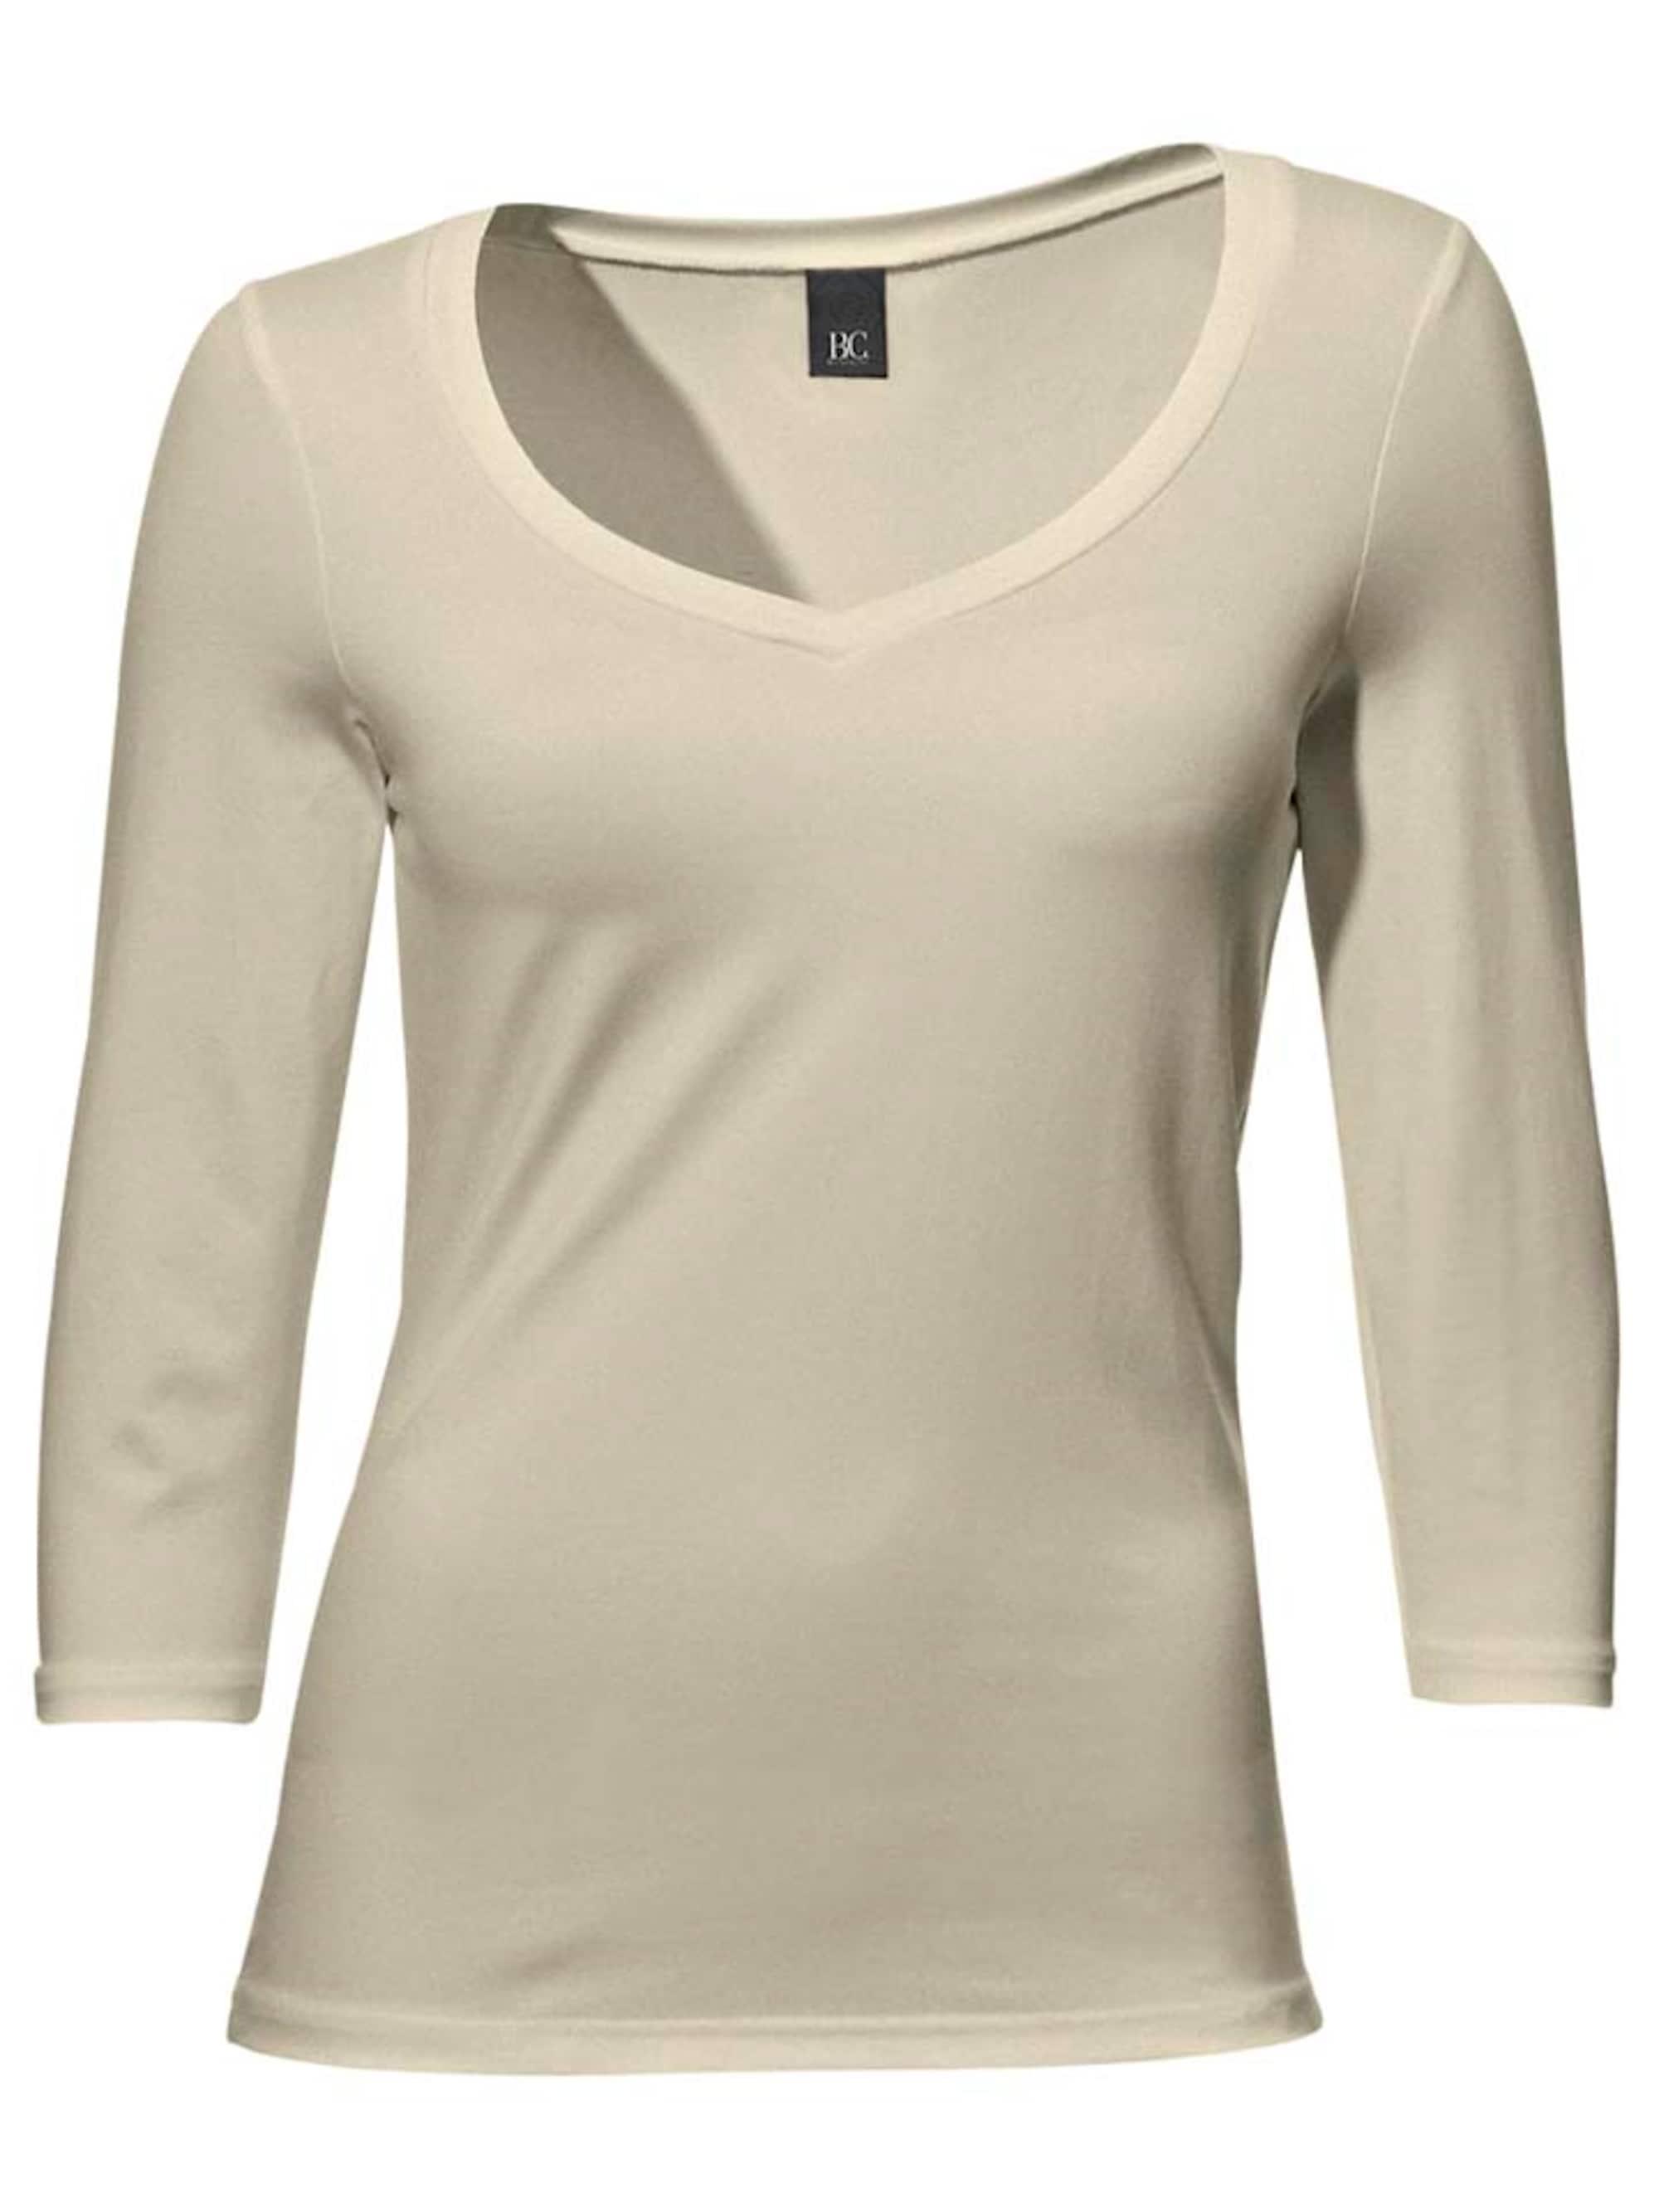 Image of Herz-Shirt